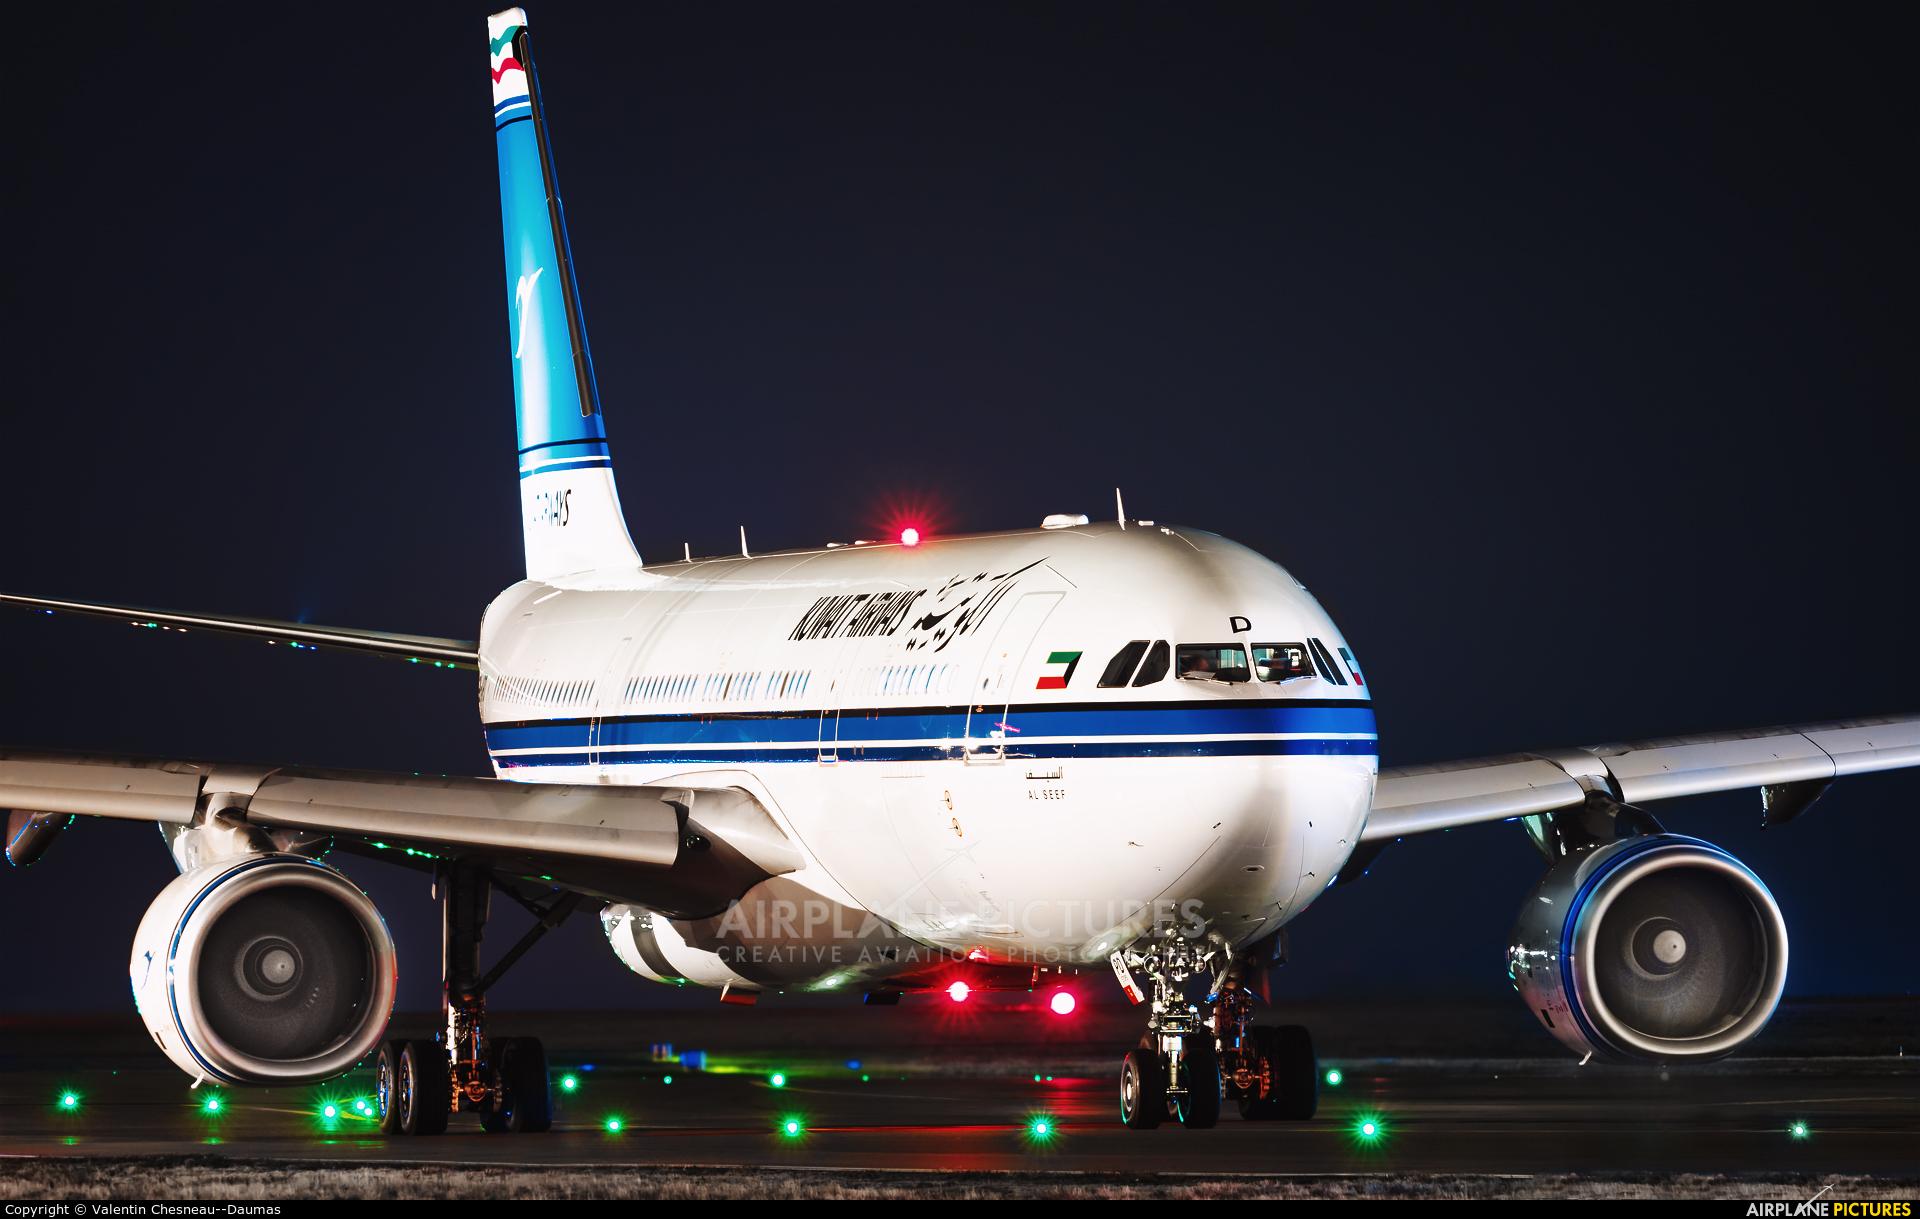 Kuwait Airways 9K-APD aircraft at Paris - Charles de Gaulle